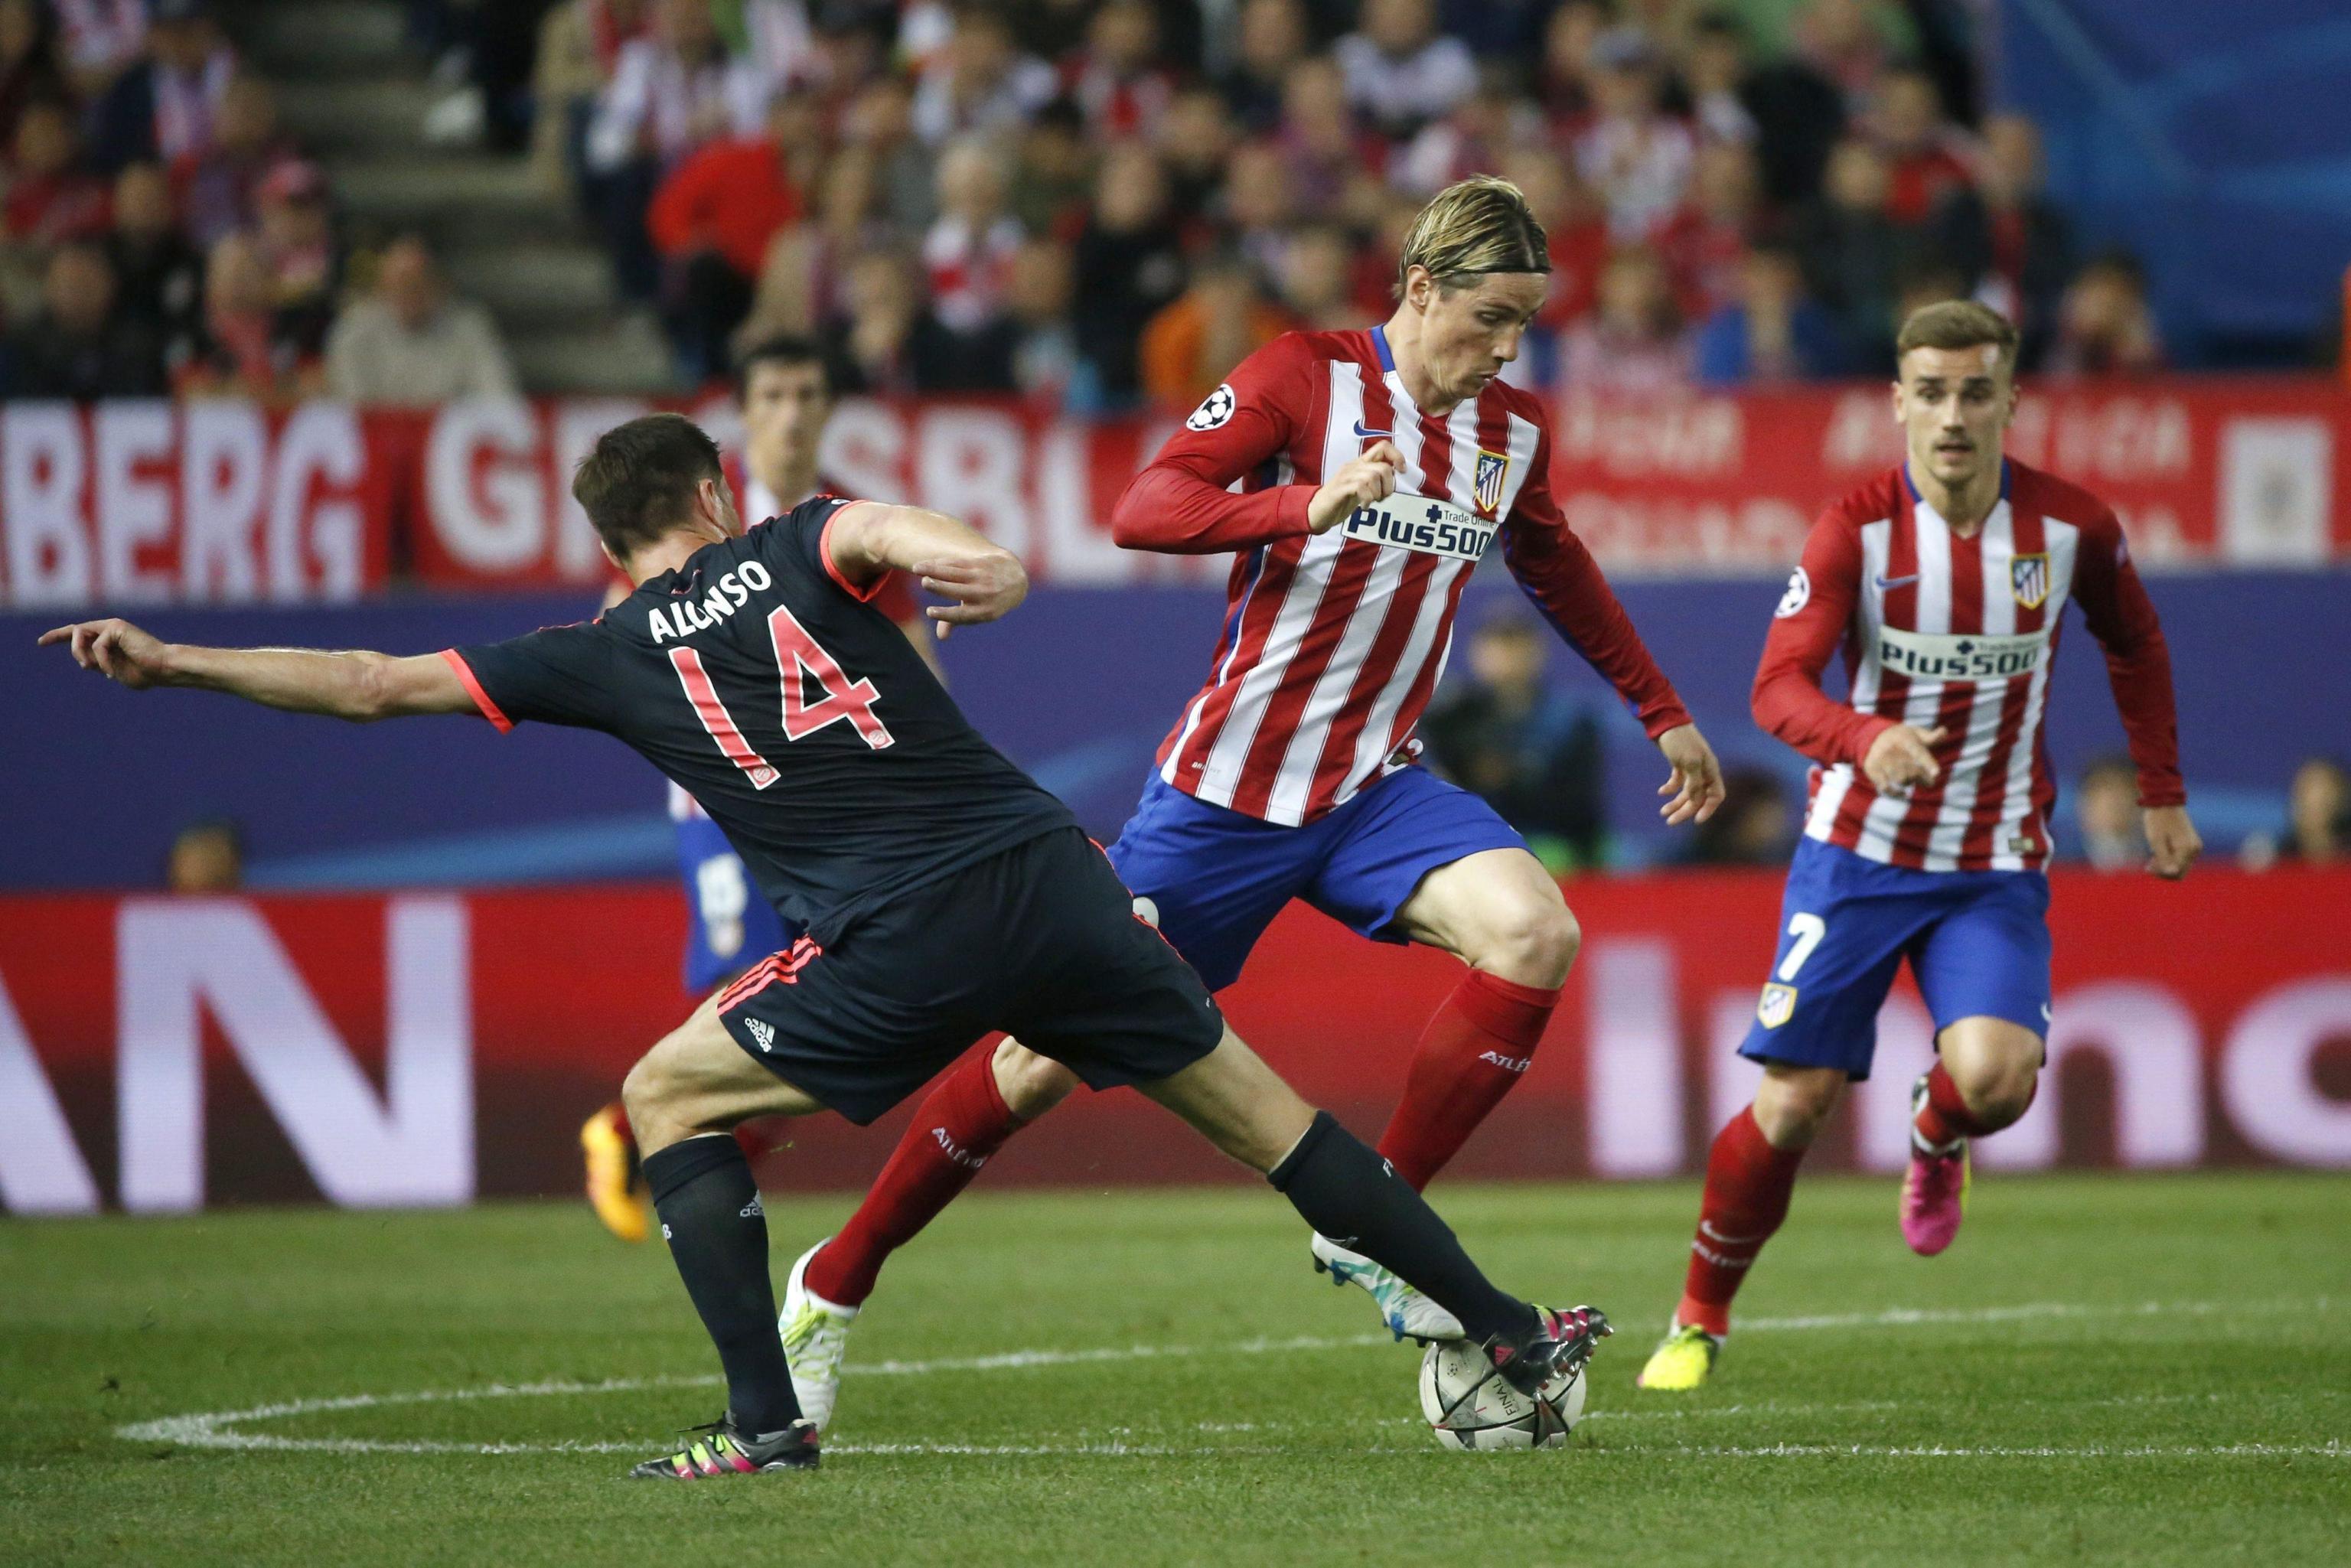 atletico bayern highlights